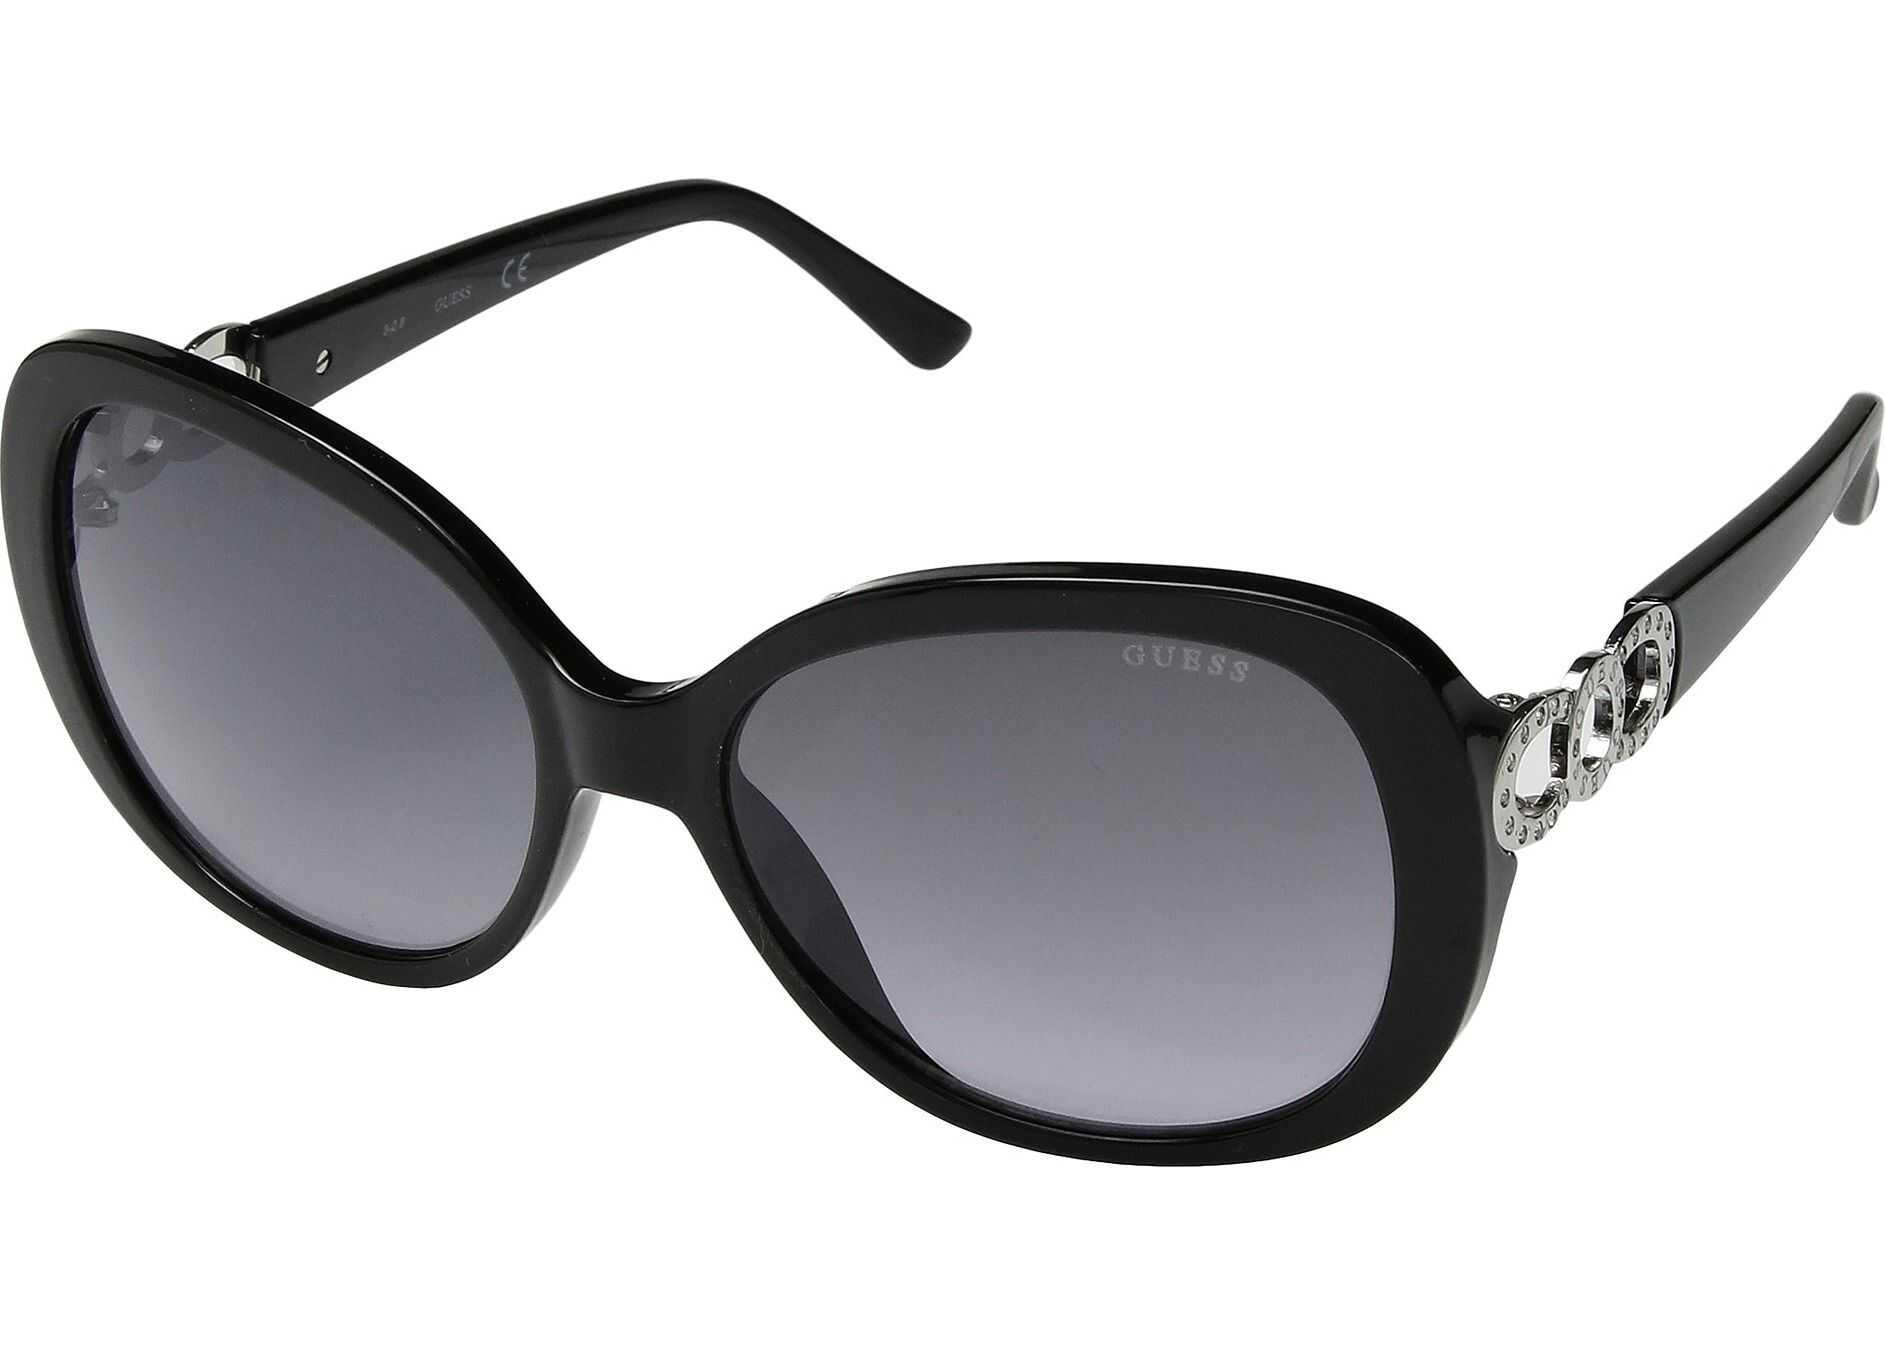 GUESS GF6083 Shiny Black/Smoke Gradient with Light Flash Lens